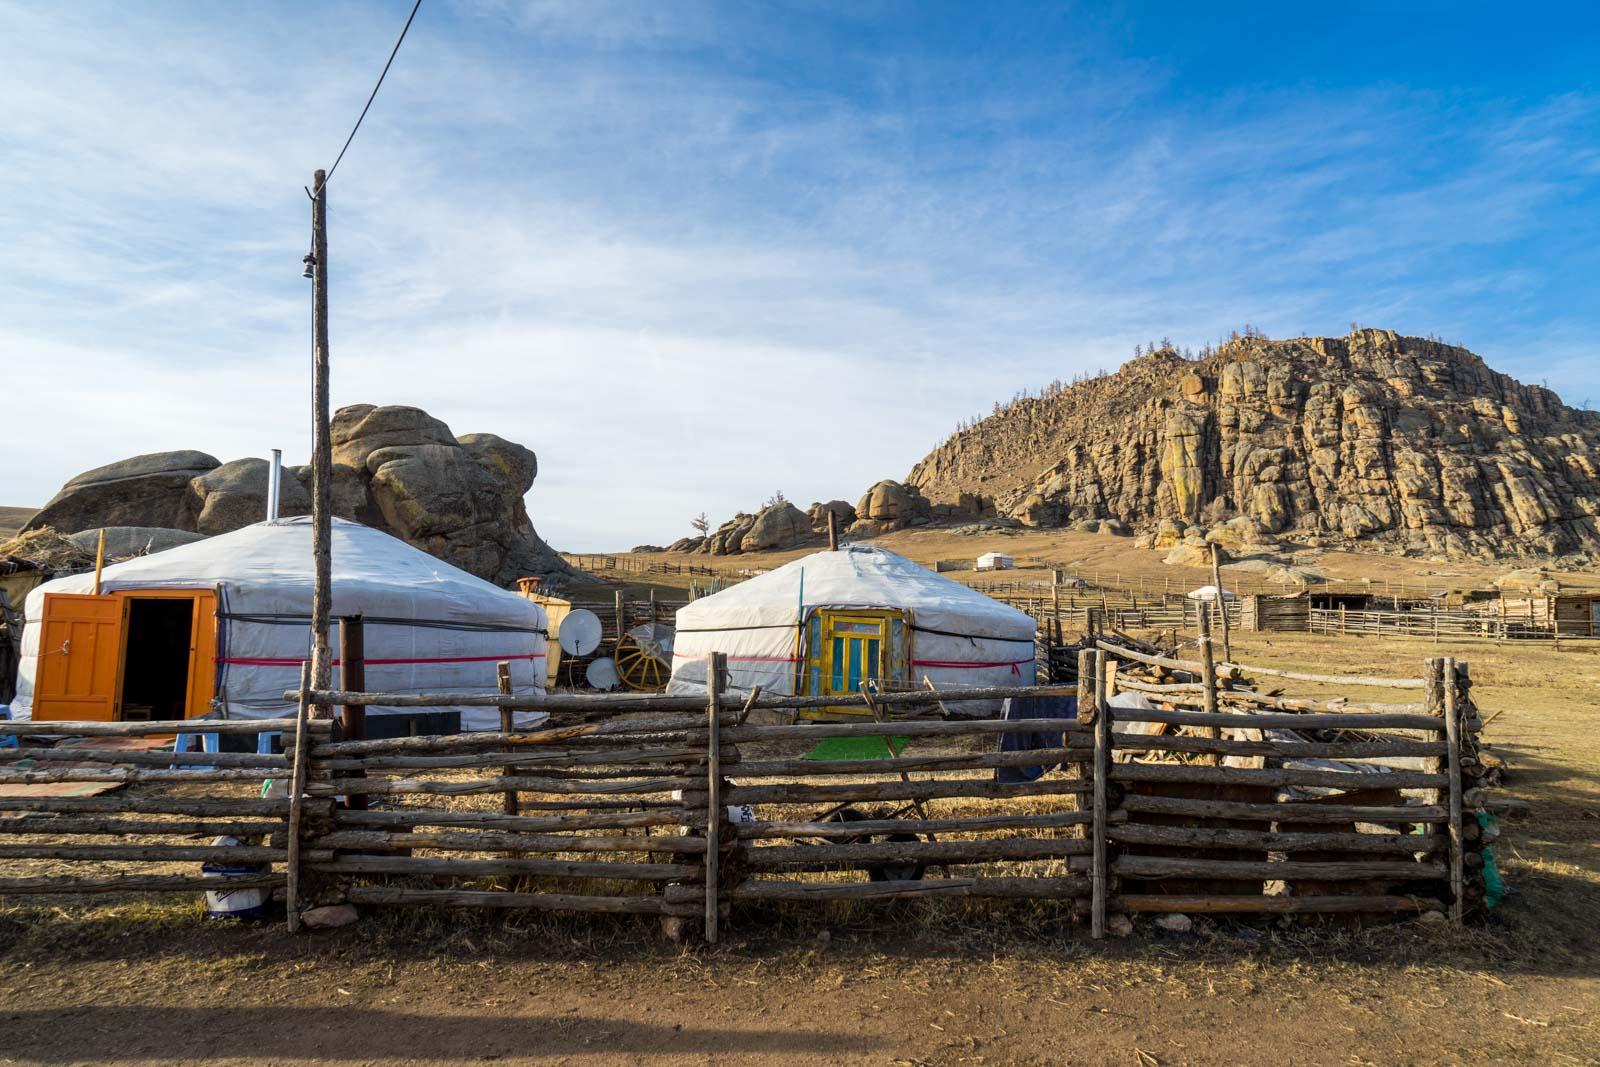 Mongolian nomadic life, visit a ger in Mongolia